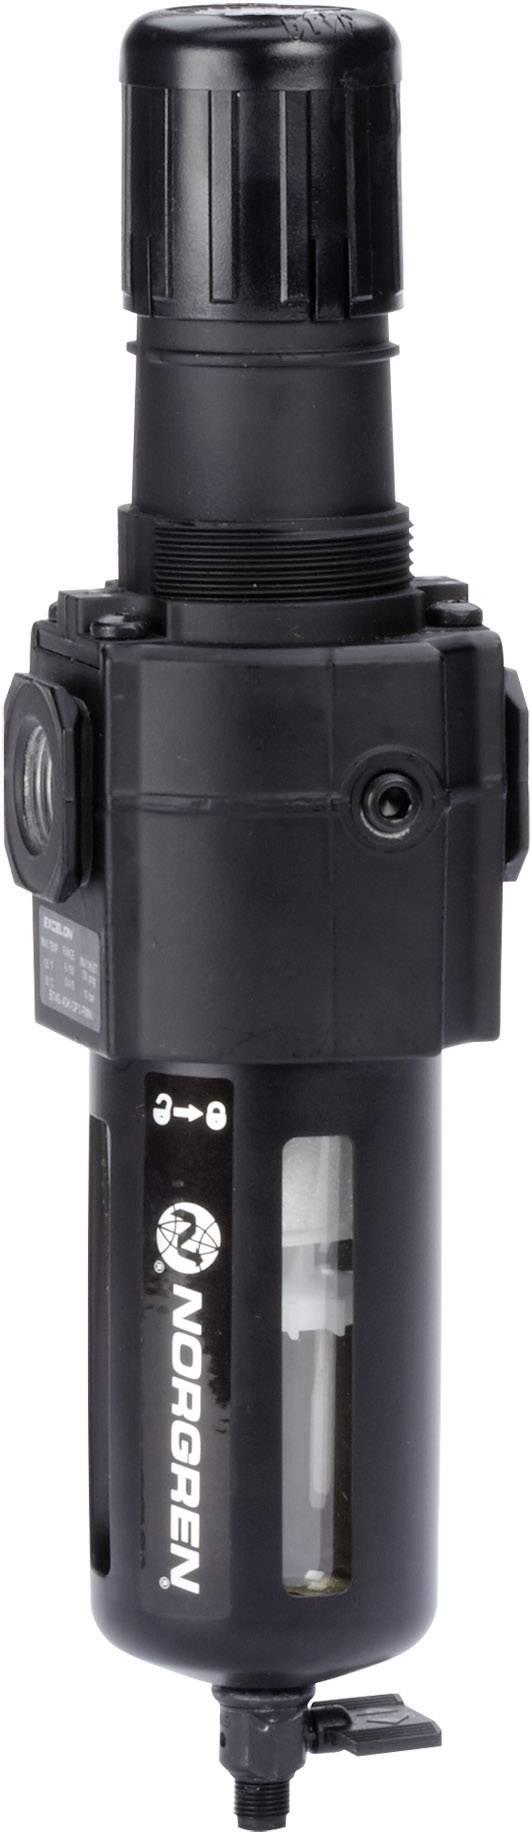 "Regulátor filtru Norgren B74G-4GK-QP3-RMN, 1/2"", 10 bar"